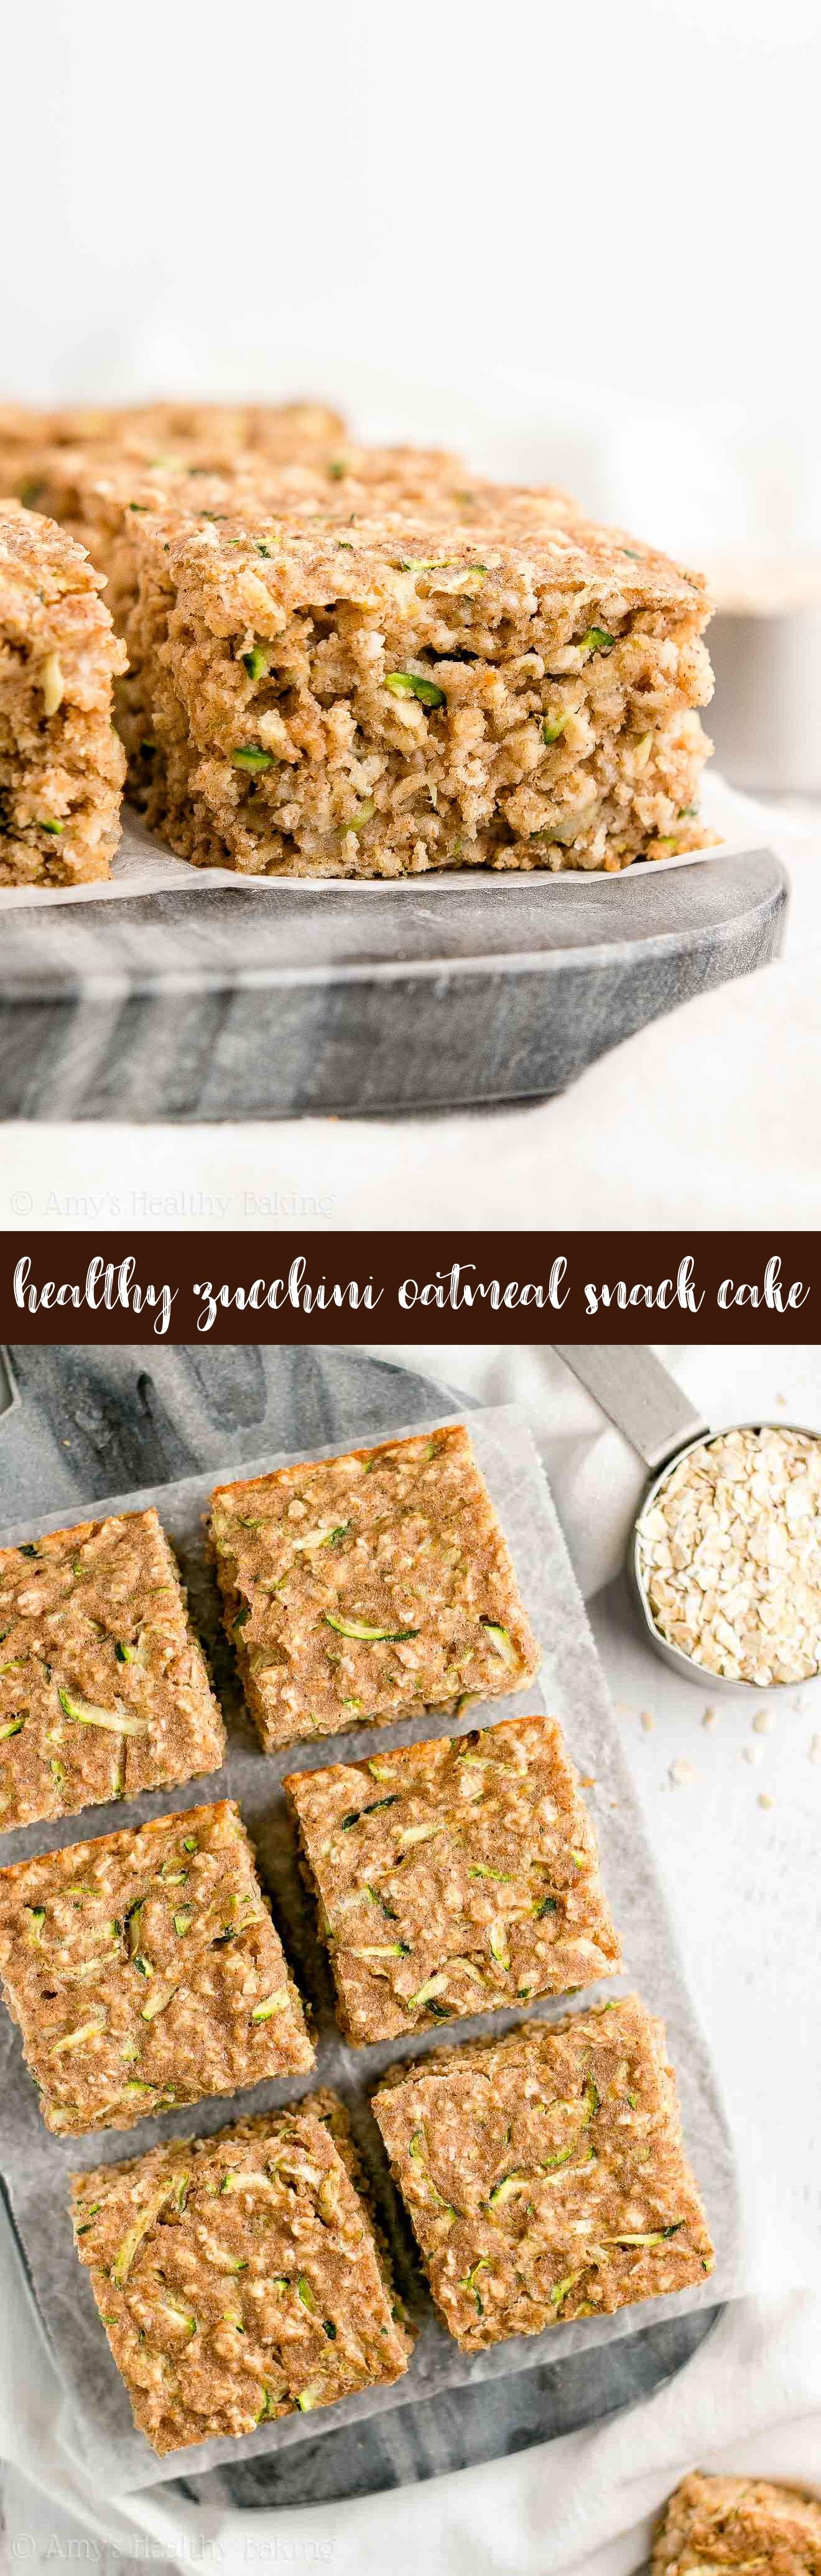 The Best Healthy Zucchini Oatmeal Snack Cake